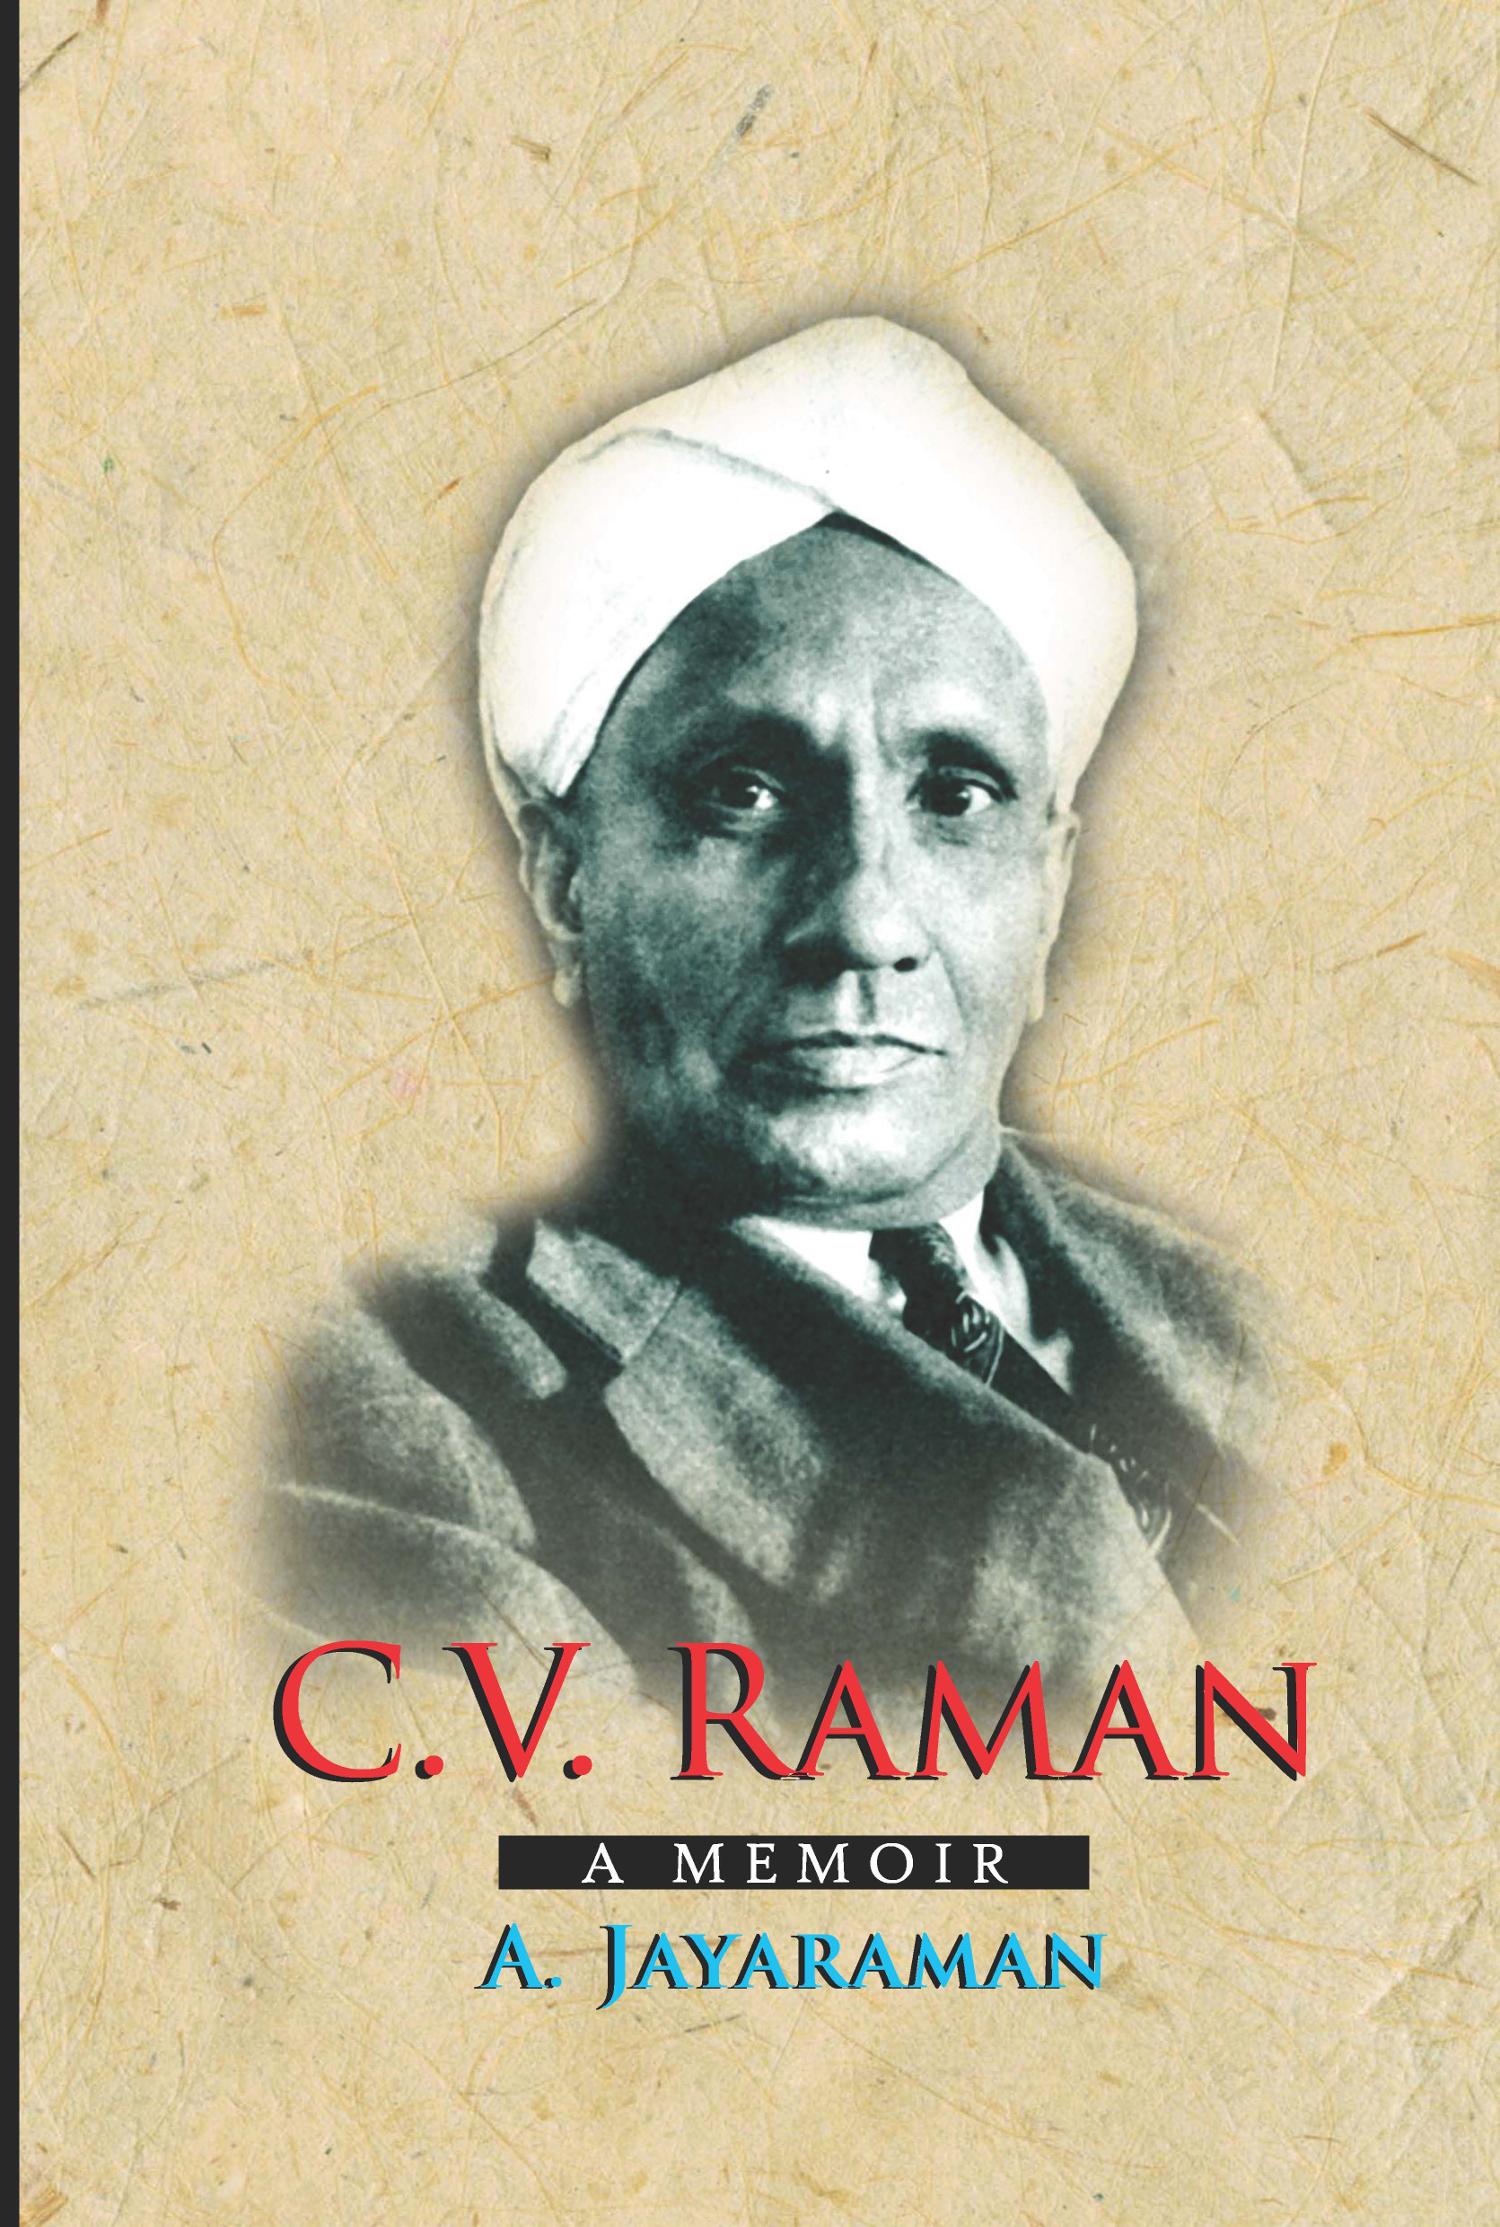 C V Raman – A Memoir